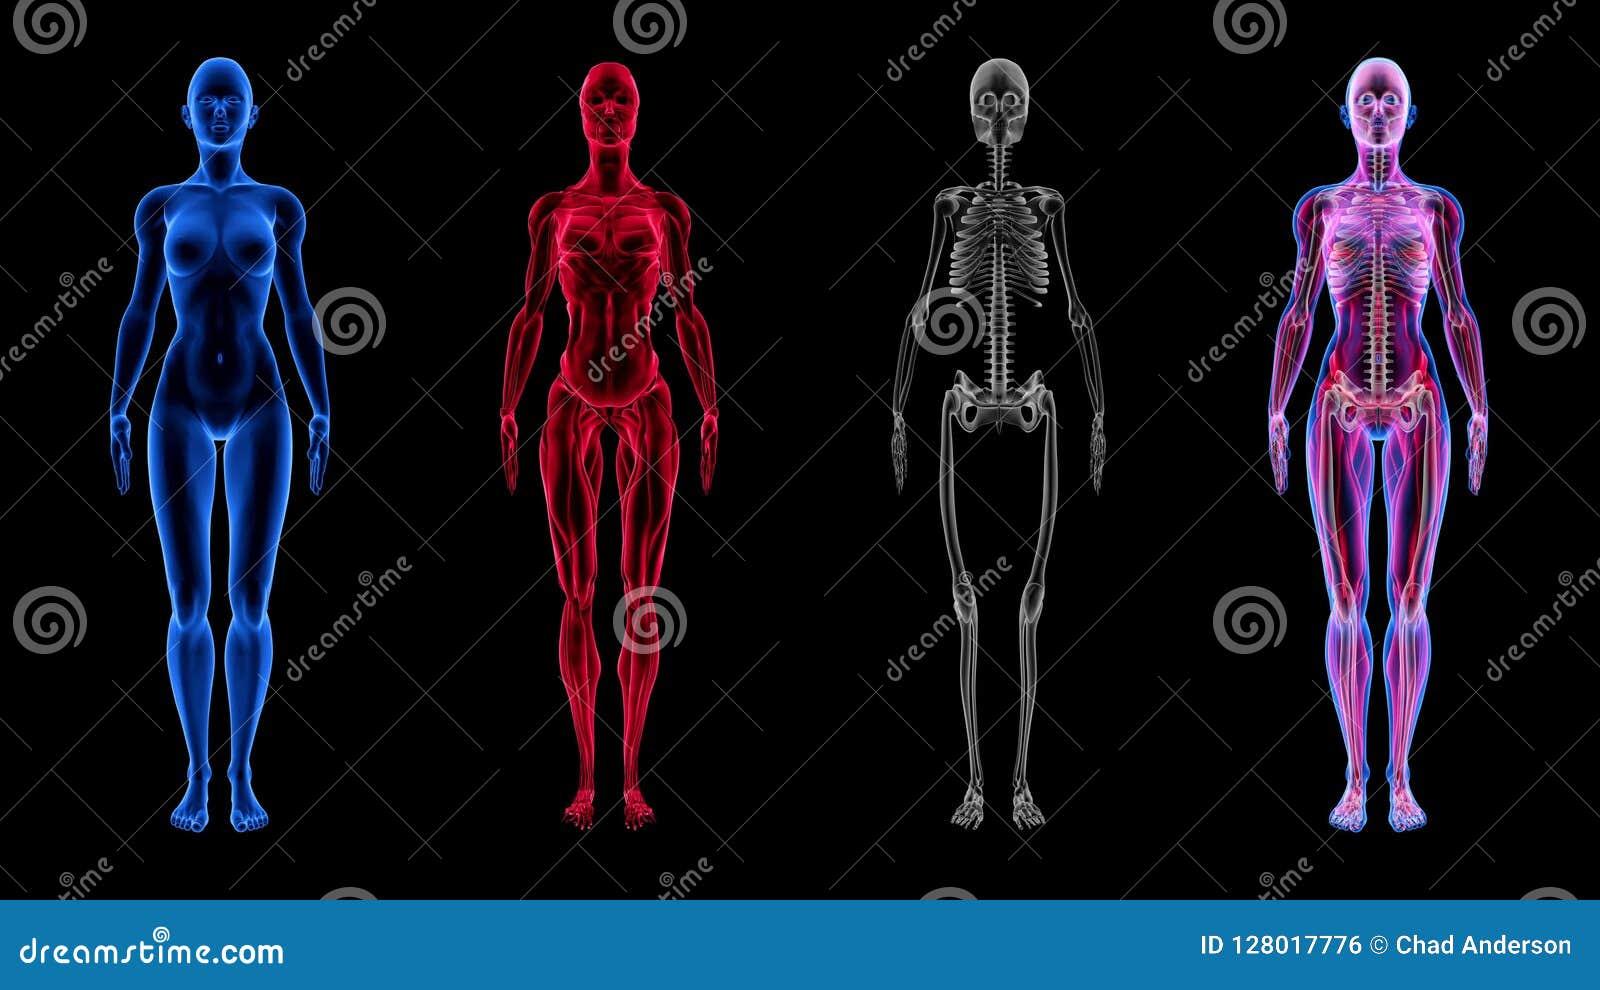 Human Female Anatomy 3d Animation Biology Science Technology Stock